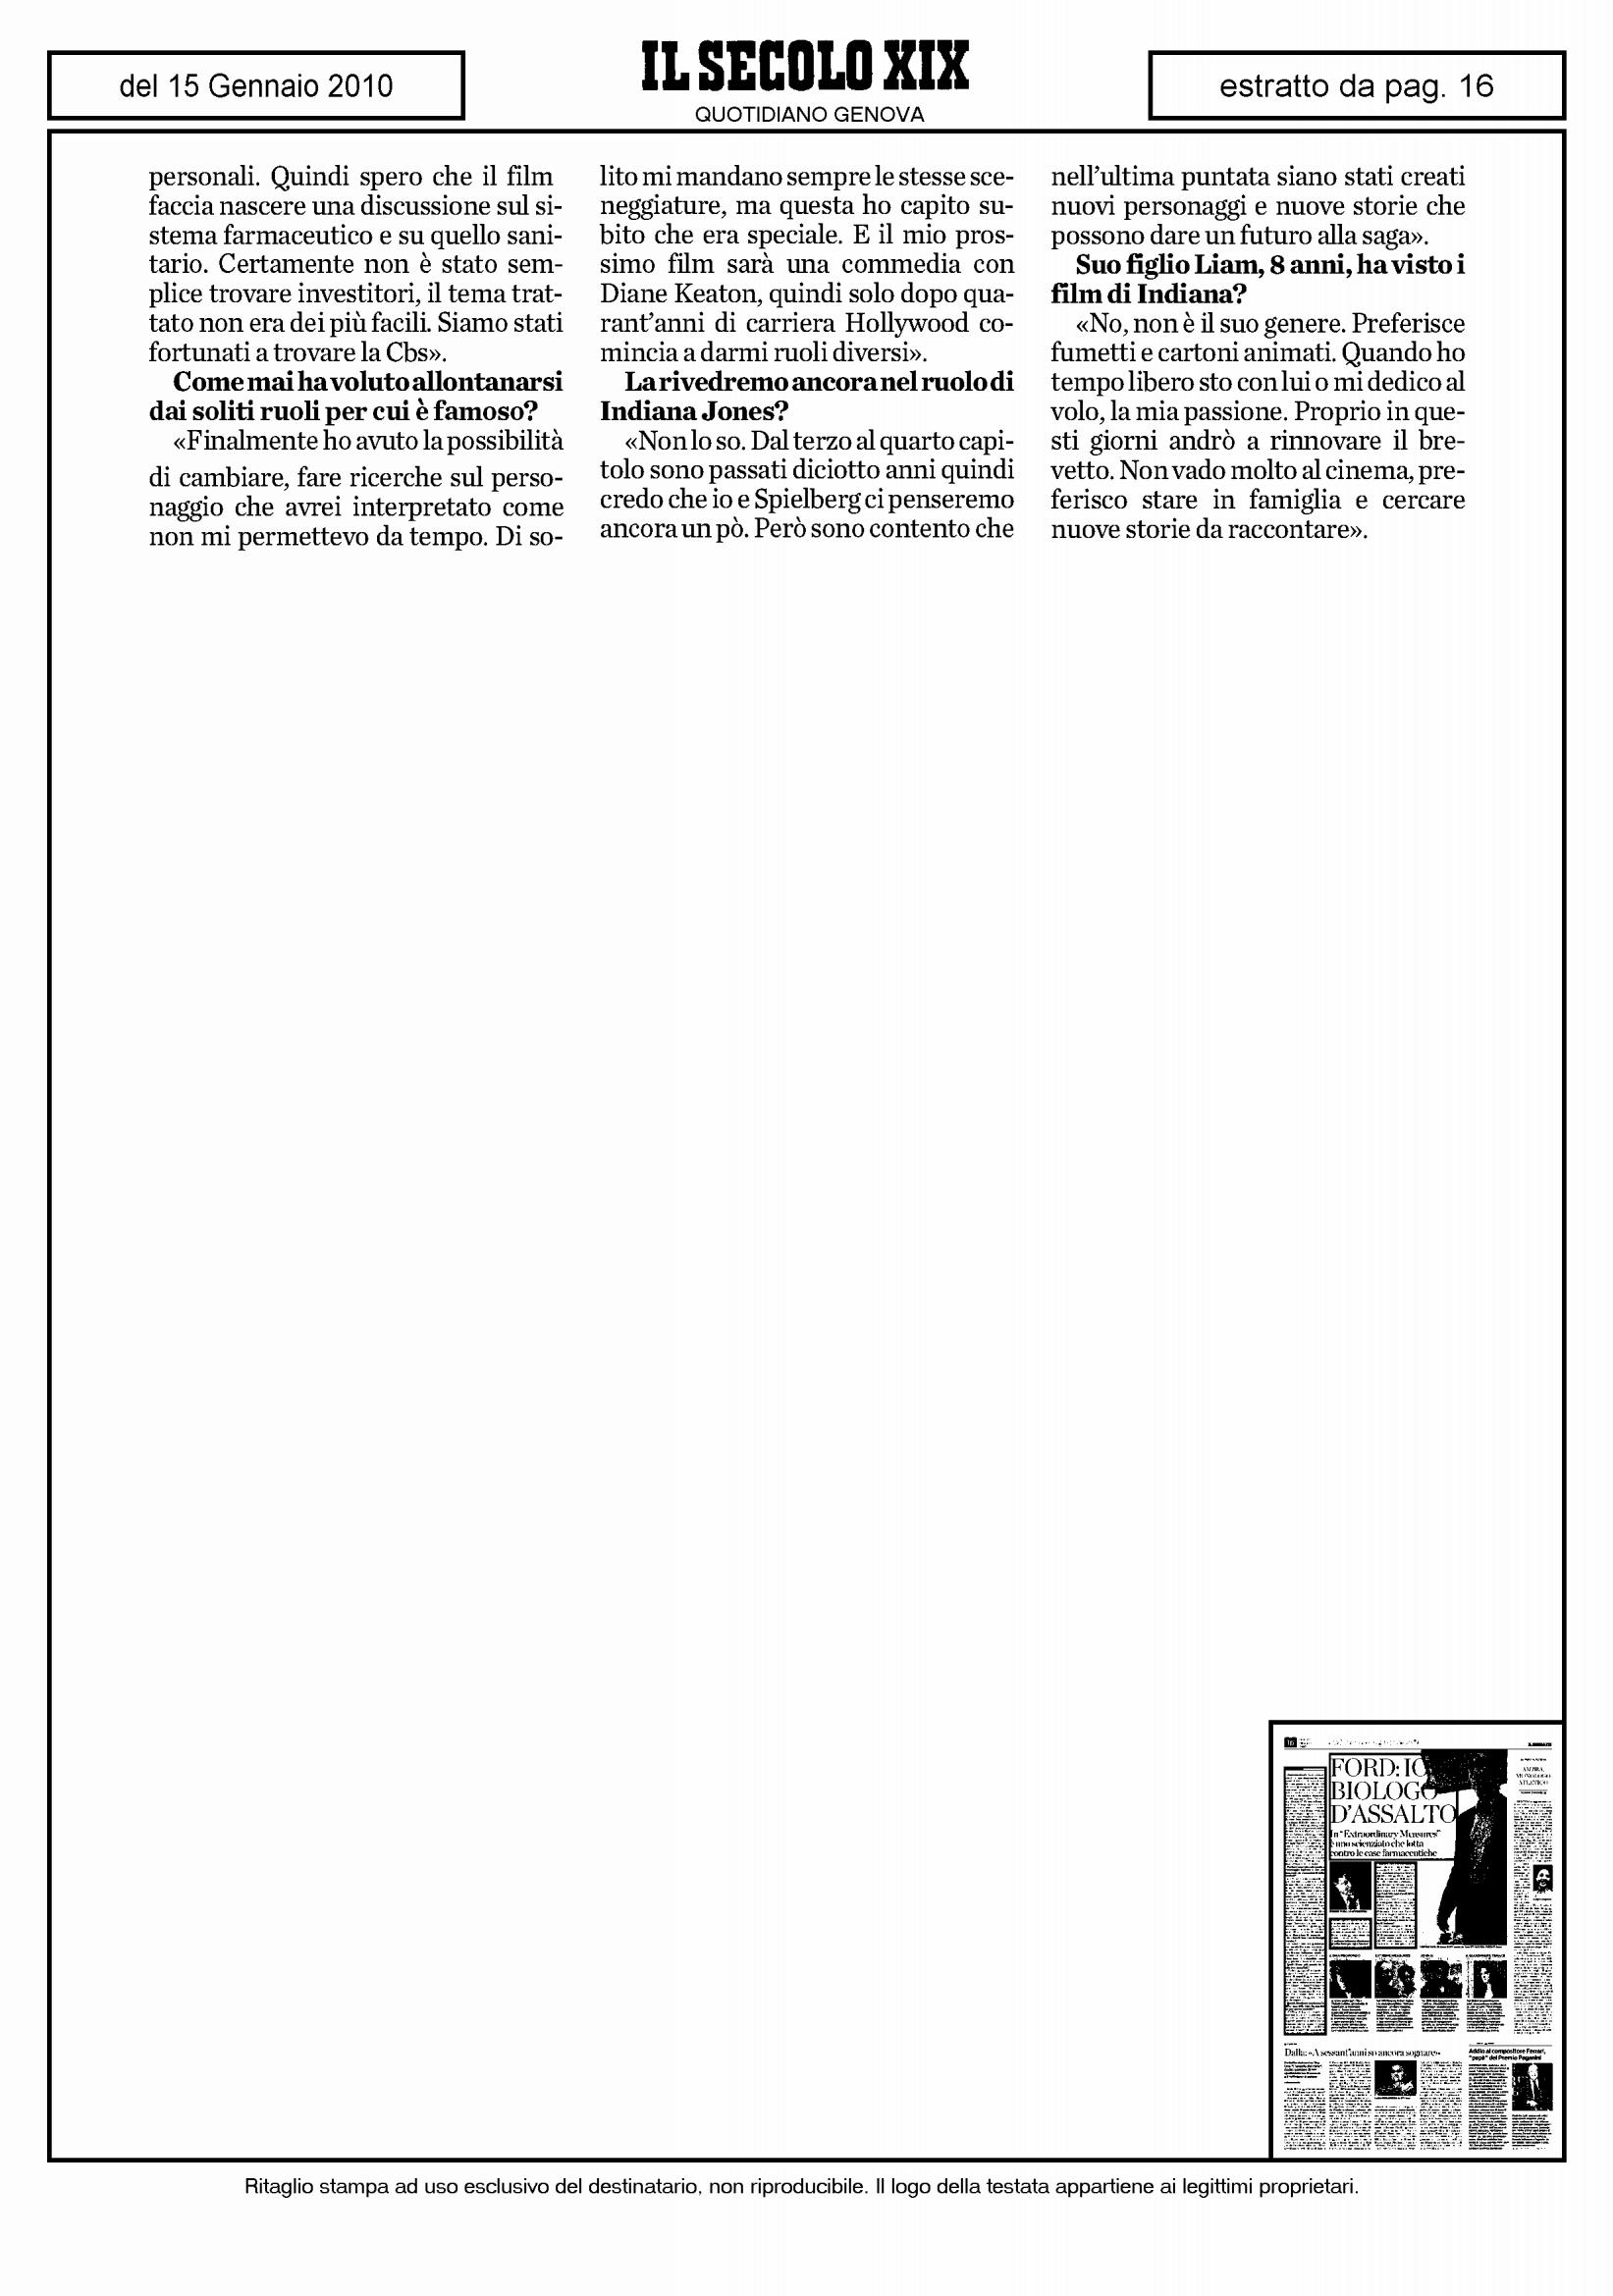 Stampa_20100422_misure straordinarie_Page_102